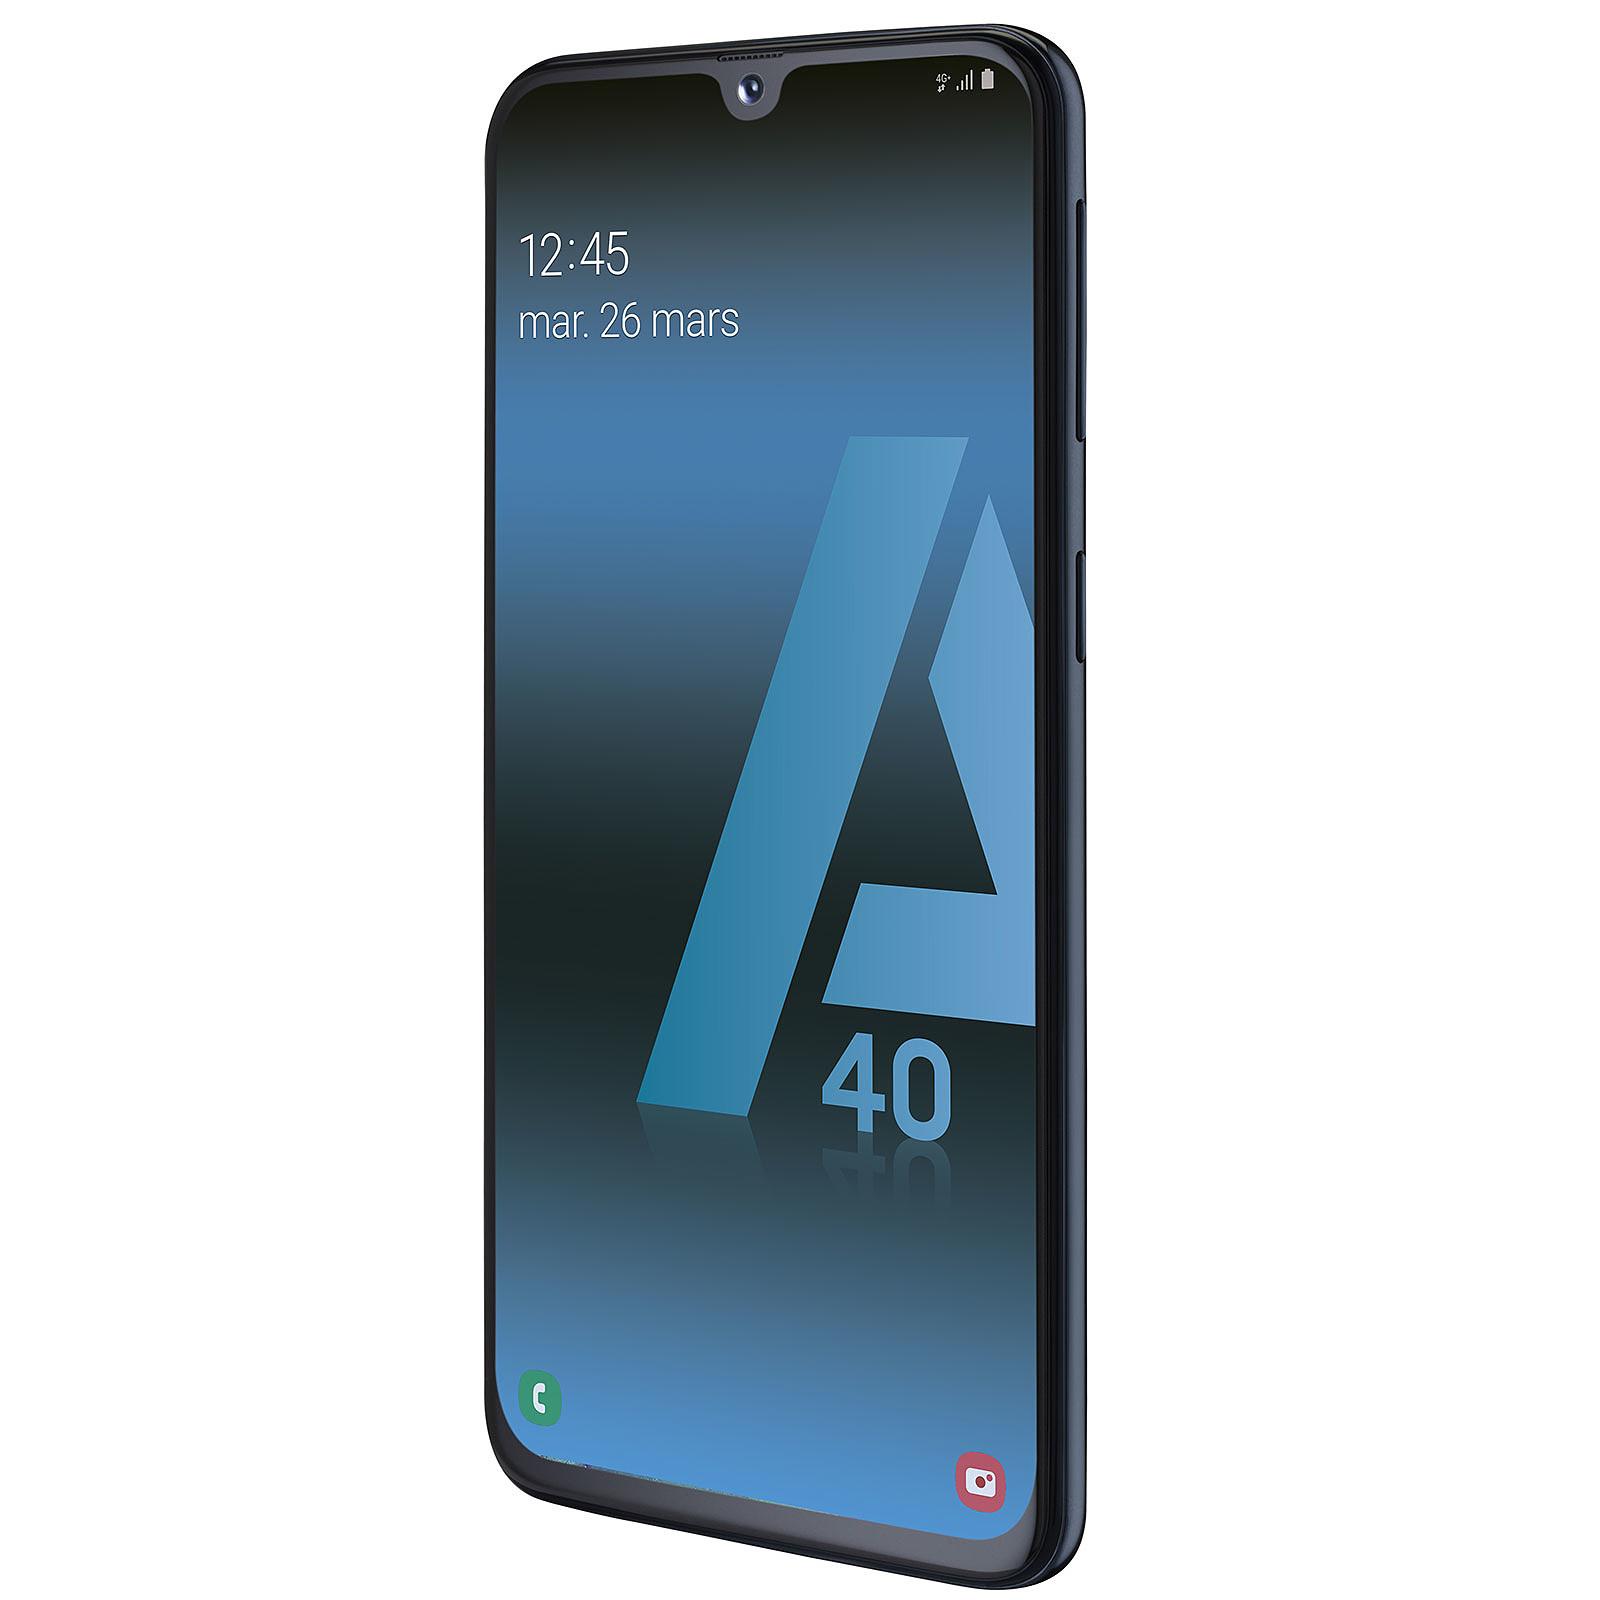 Image 1 : [Promo] Le Samsung Galaxy A40 + coque de protection à 259 €